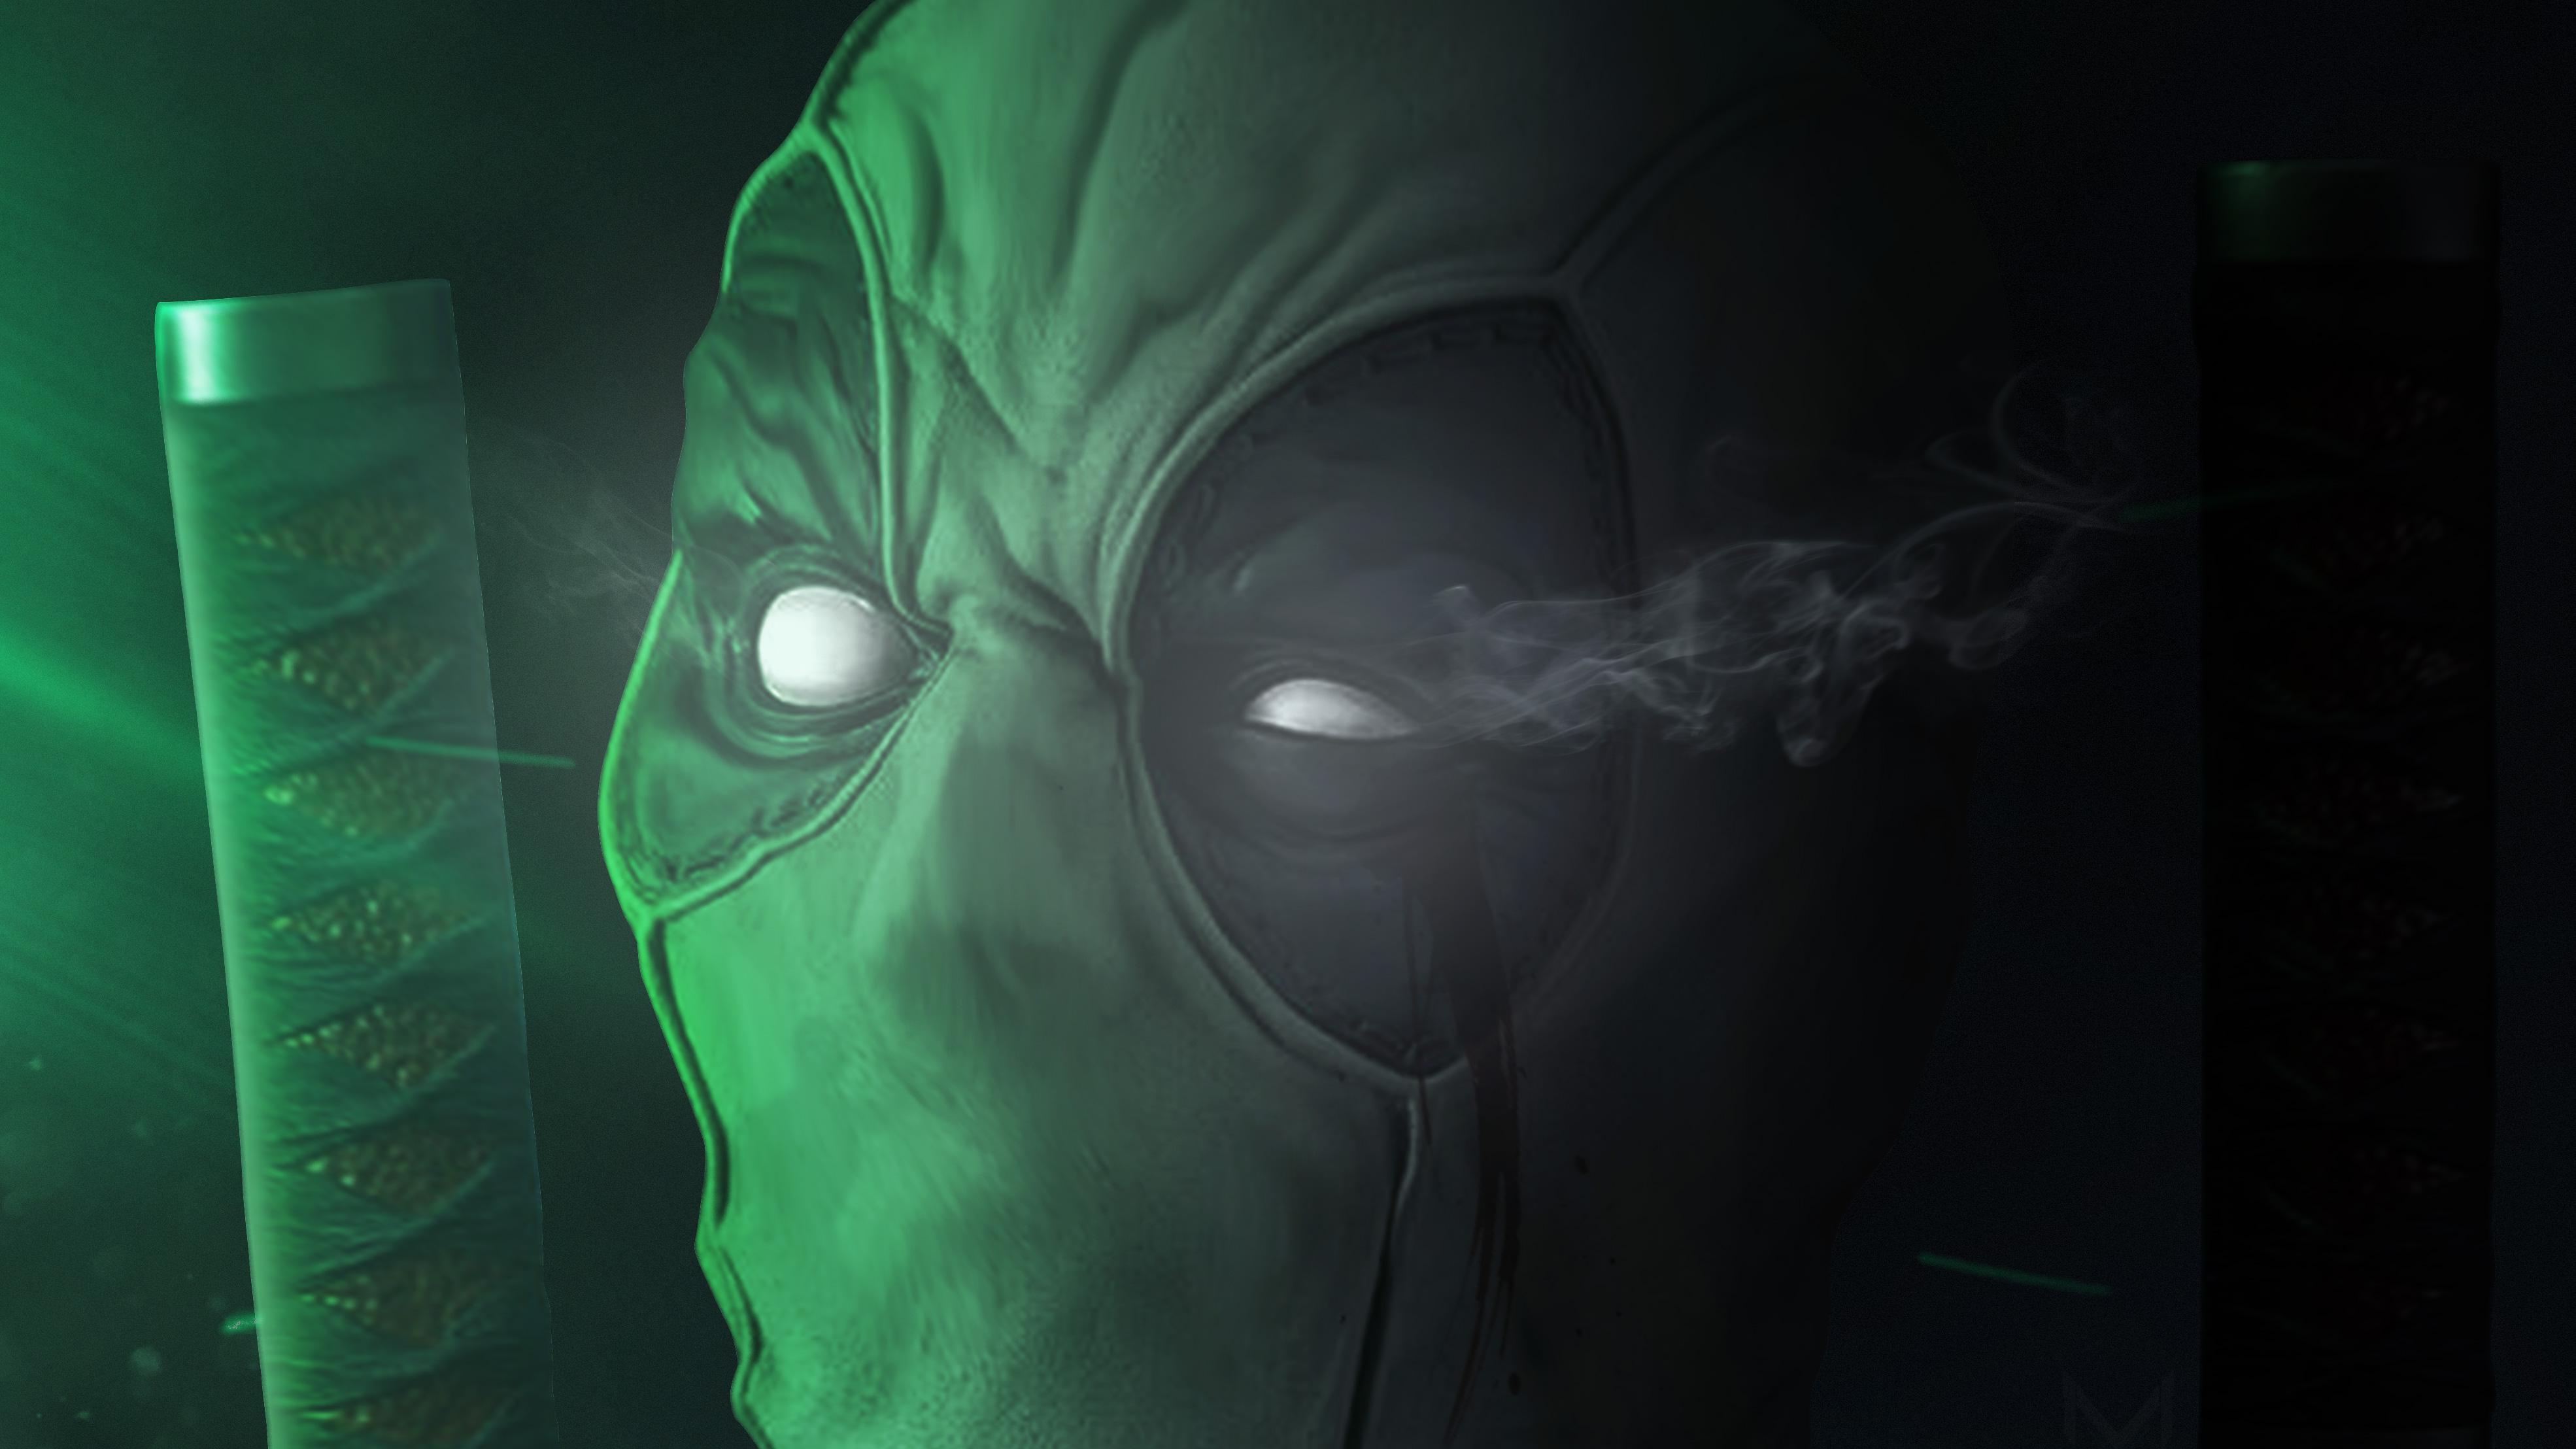 4k Deadpool Digital Art Hd Superheroes 4k Wallpapers